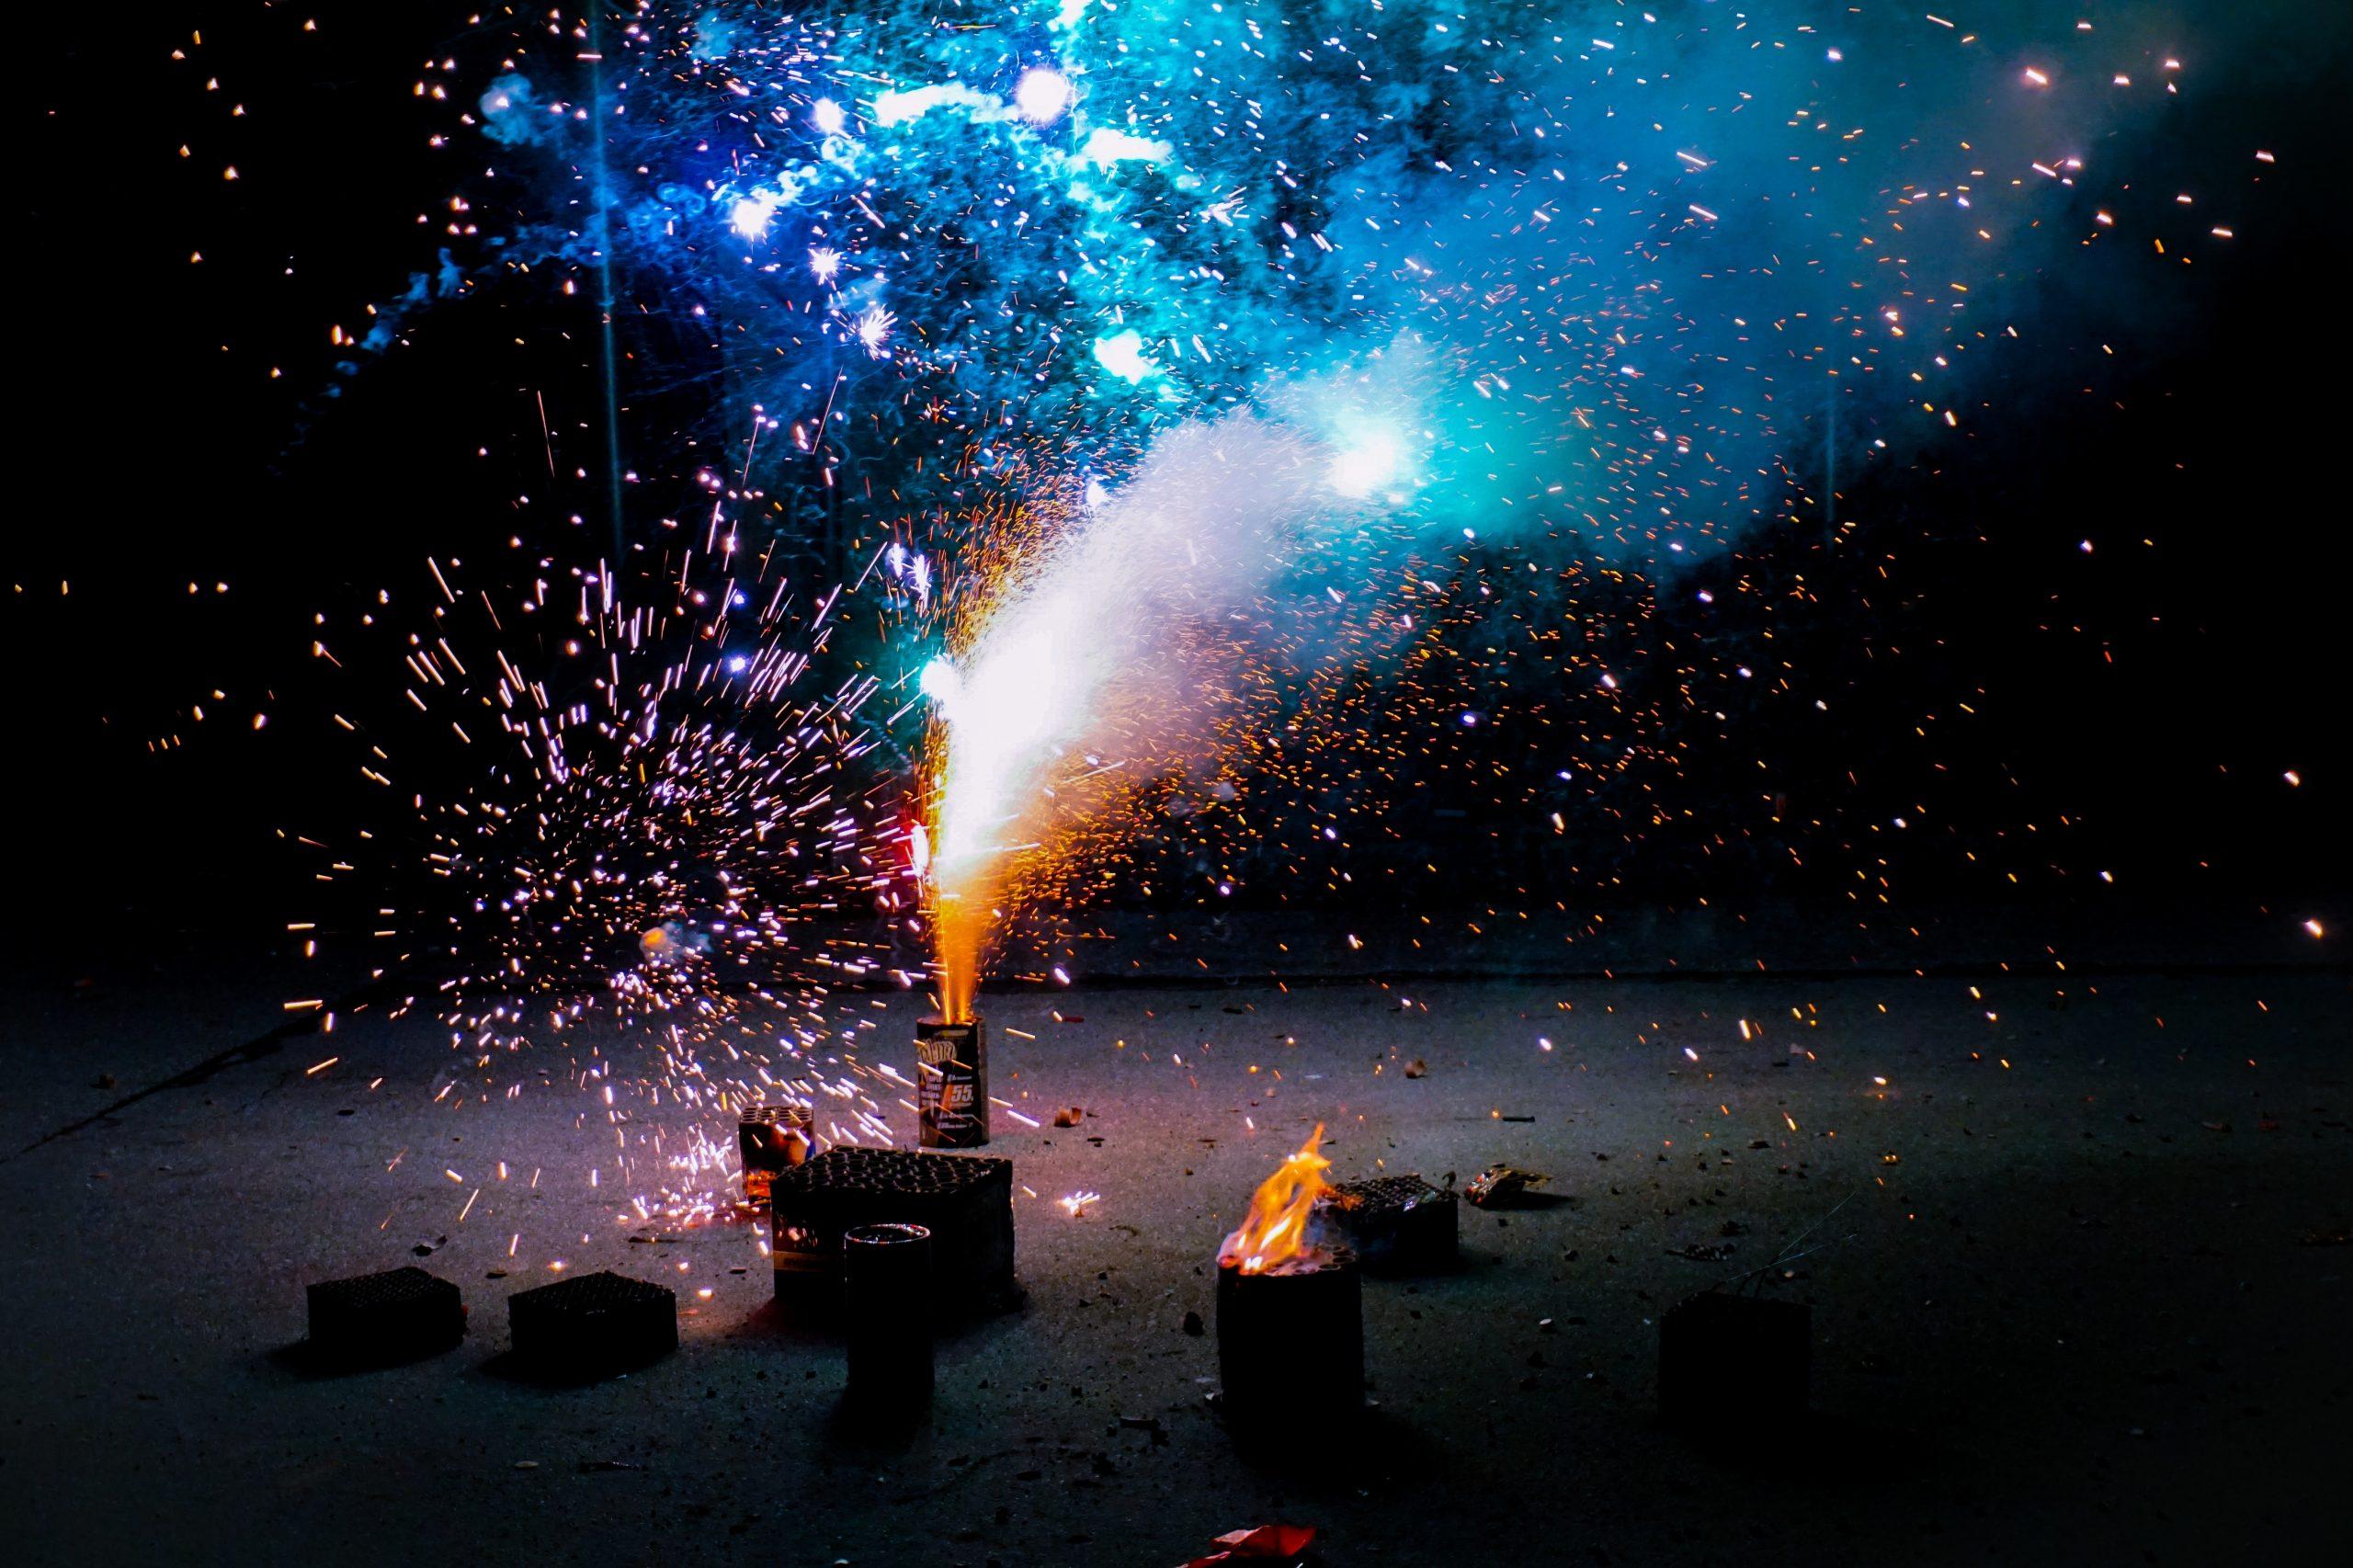 New Year, new firework recording. Happy 2020!